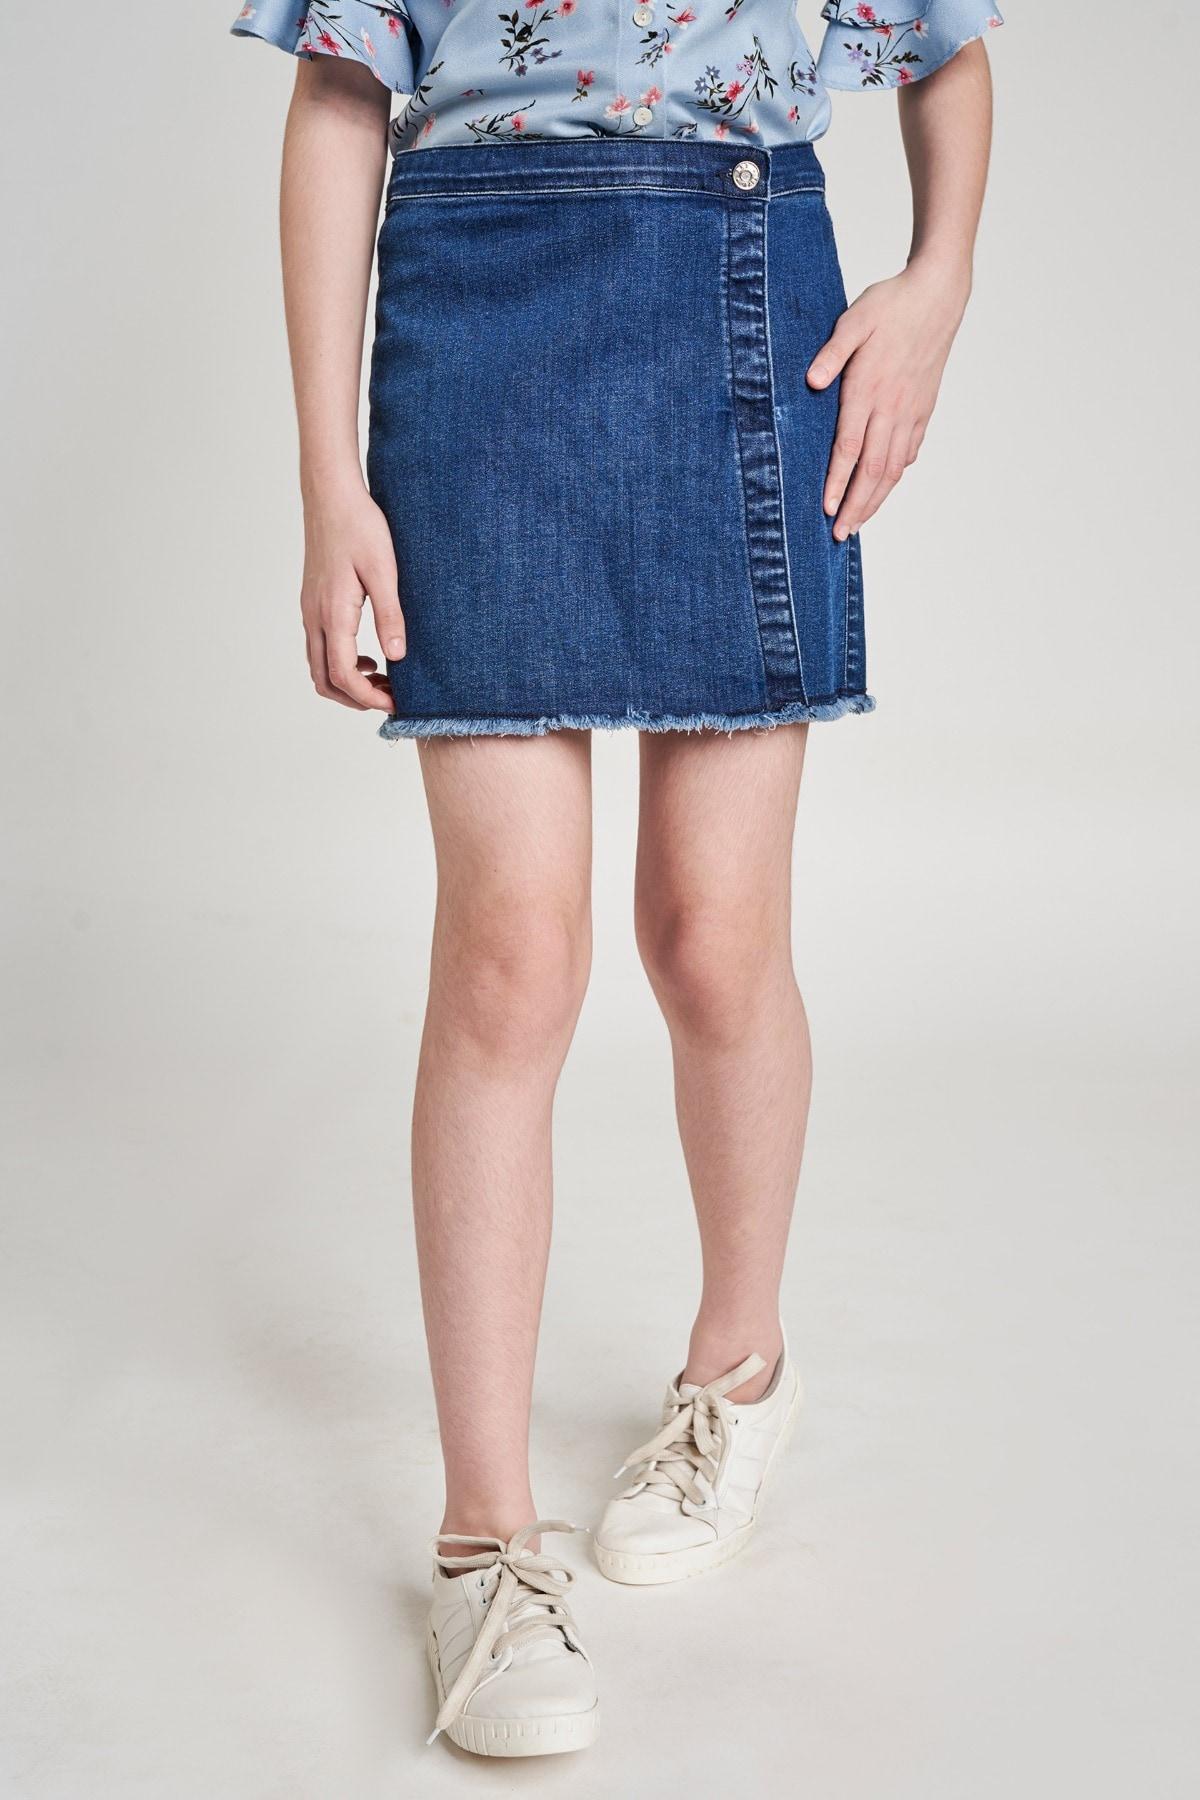 AND | Dark Blue Self Design Shorts